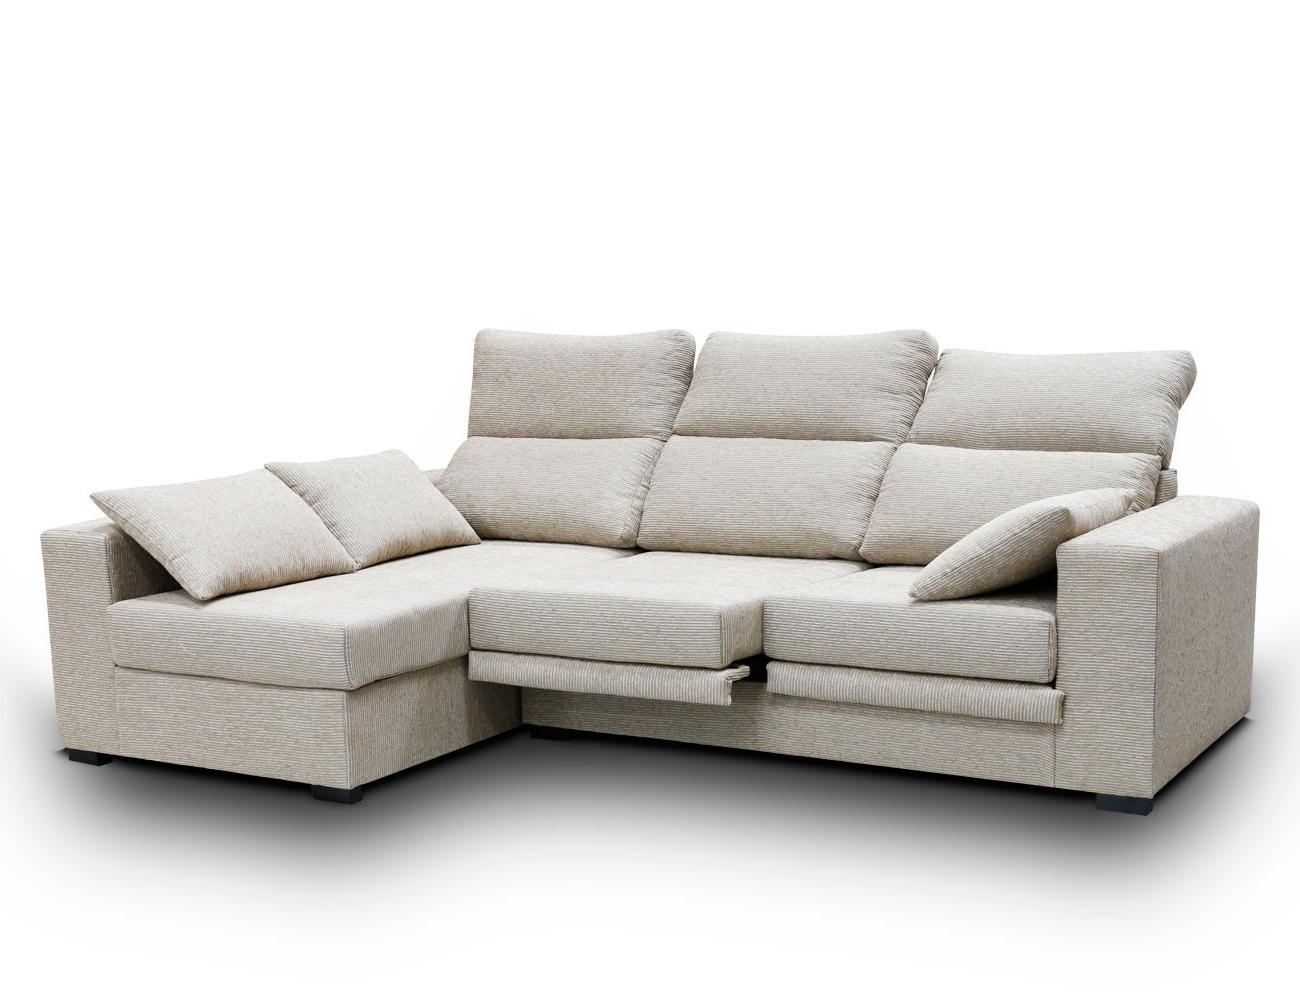 Sofa Chaise Longue Barato T8dj Grand sofas Chaise Longue Baratos 10